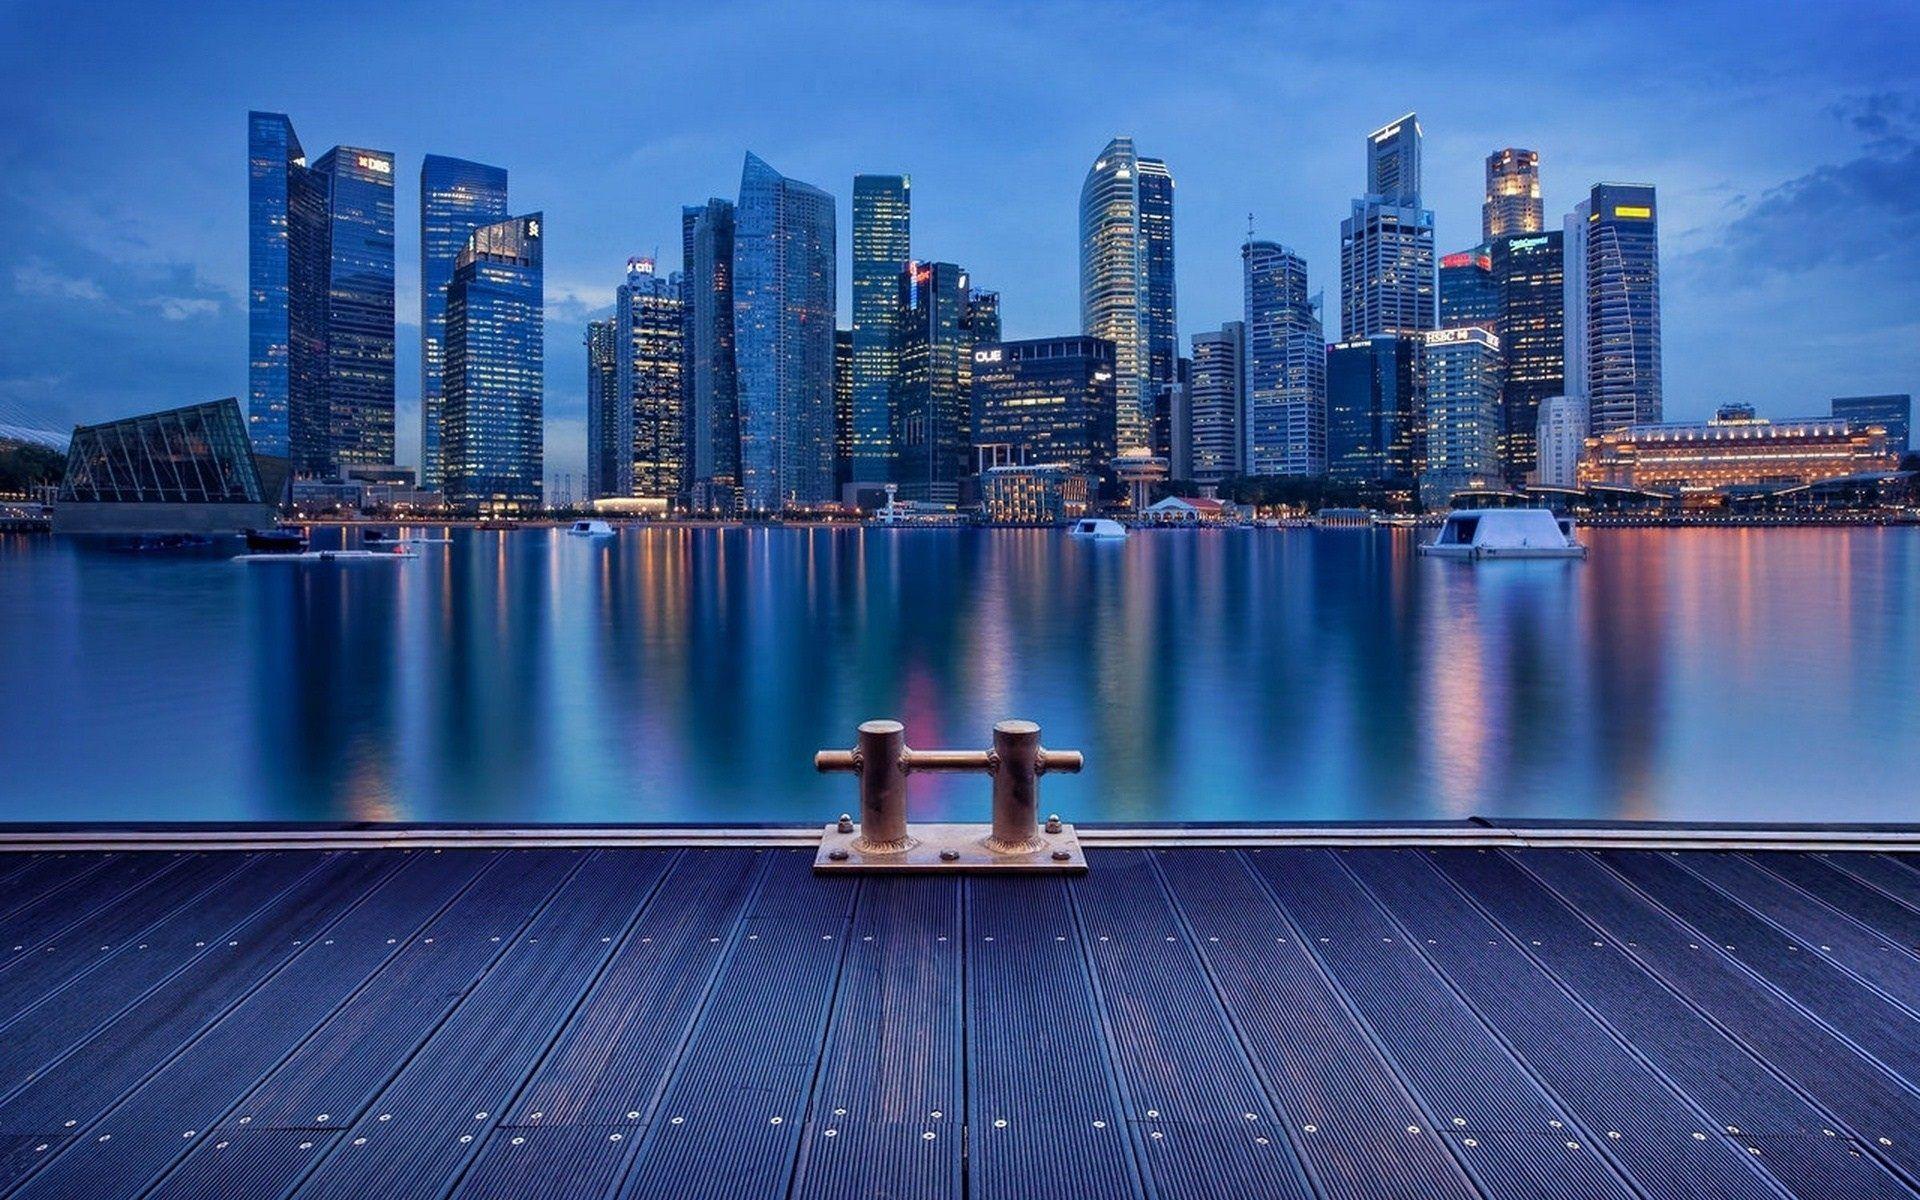 pin city nightlife wallpaper - photo #21